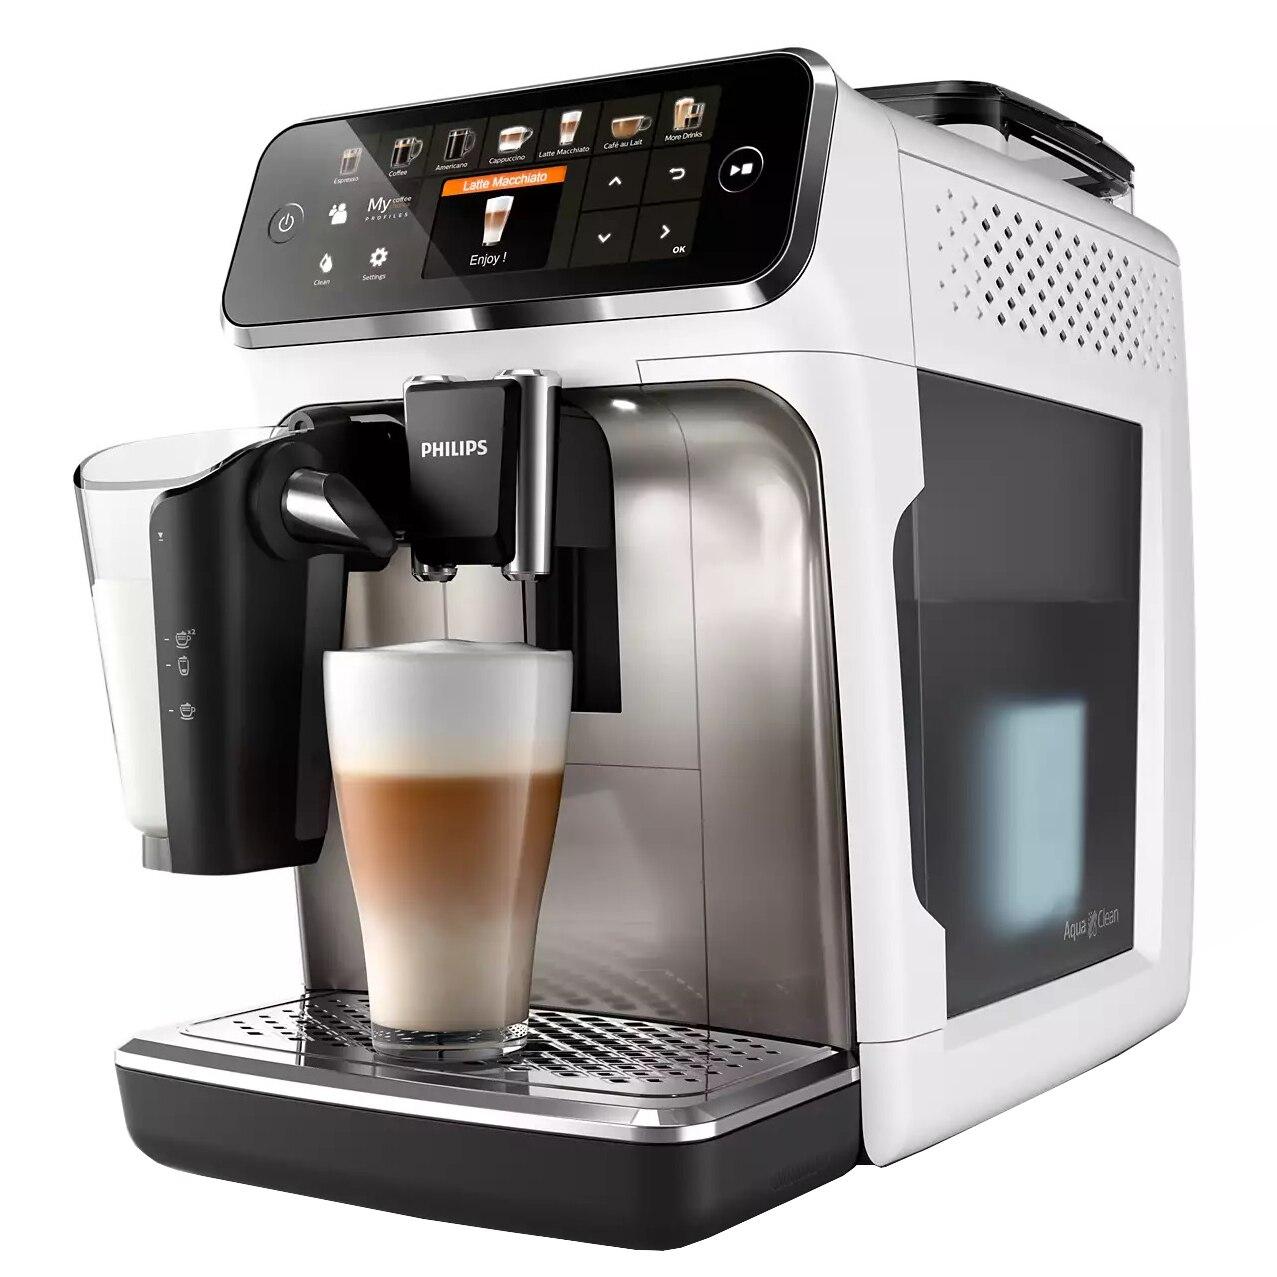 Fotografie Espressor automat Philips Seria 5400 EP5443/90, sistem de lapte LatteGo, 12 bauturi, display digital TFT si pictograme color, filtru AquaClean, rasnita ceramica, optiune cafea macinata, functie MEMO 4 profiluri, Alb